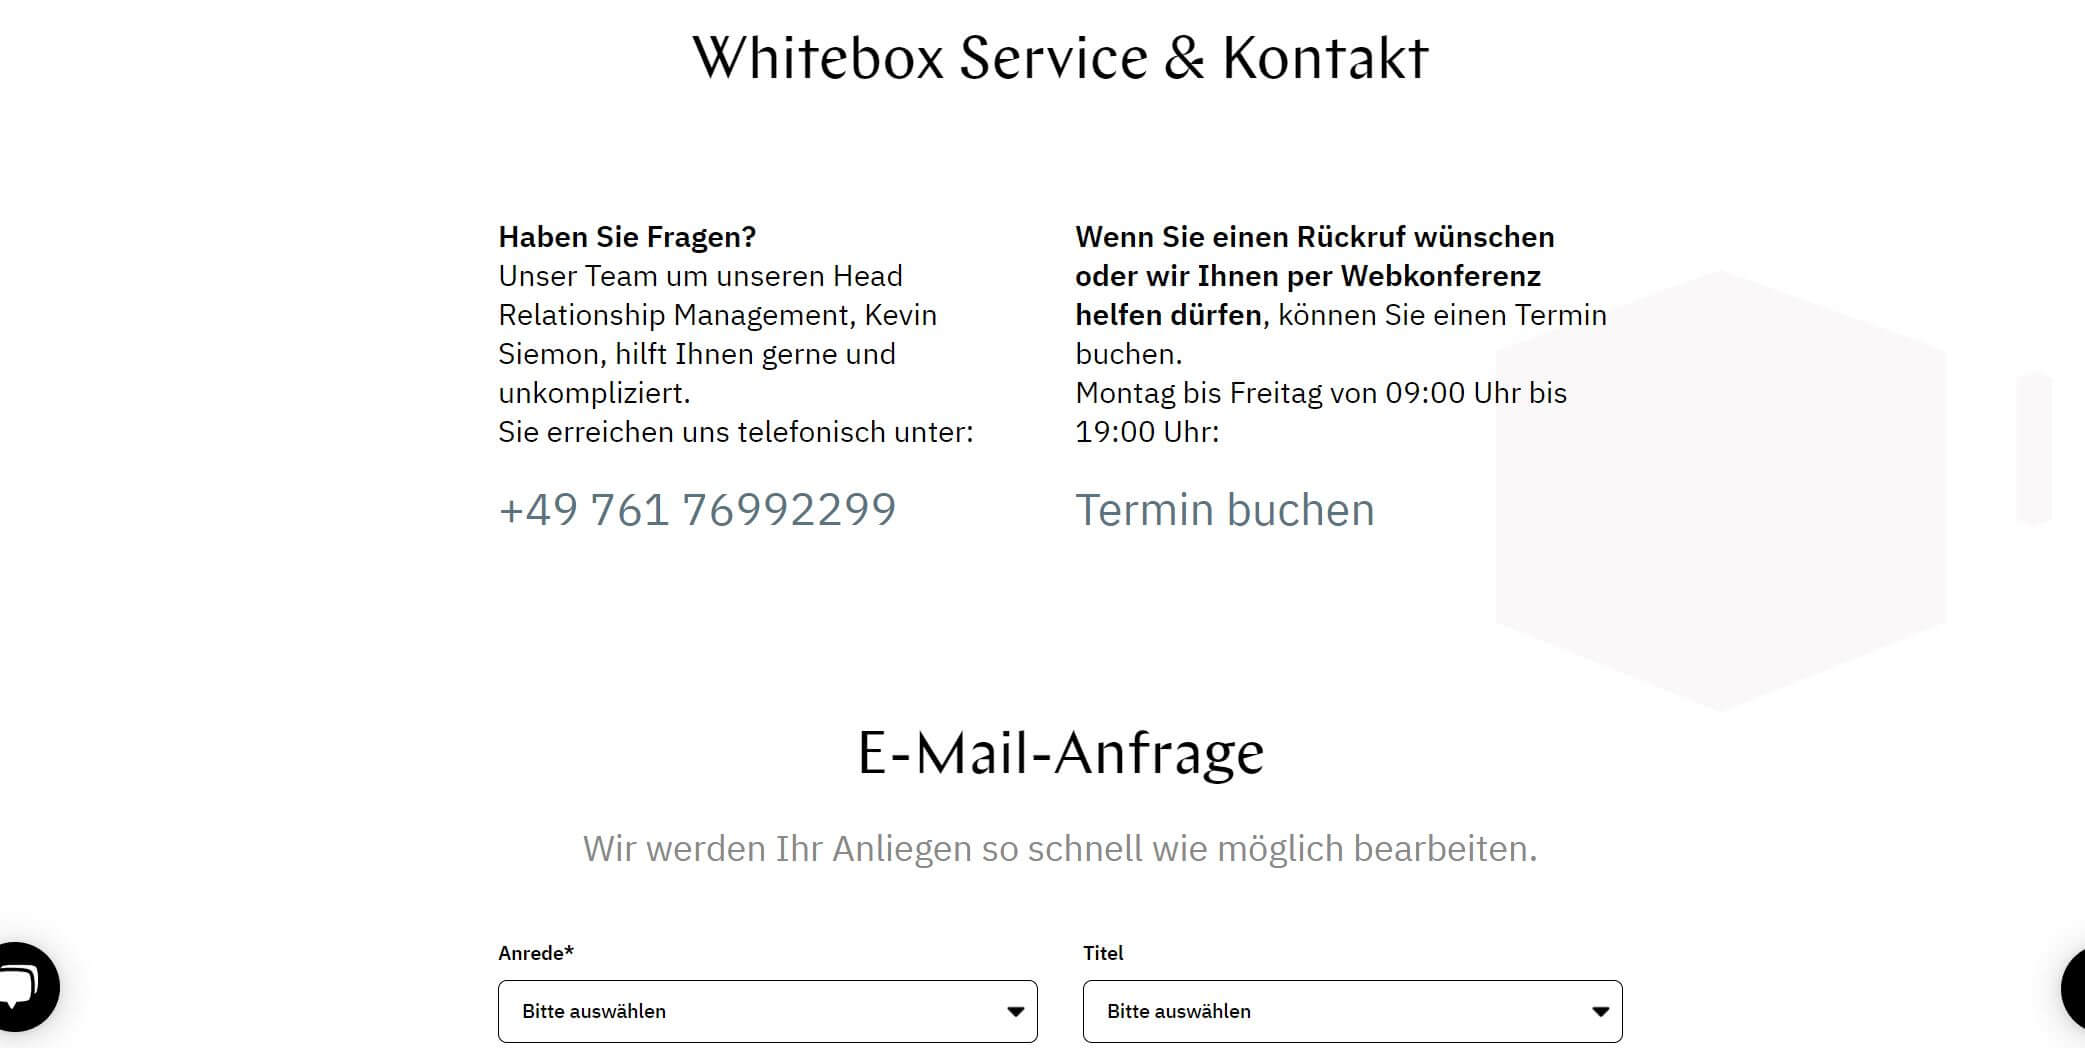 Whitebox Kontakt